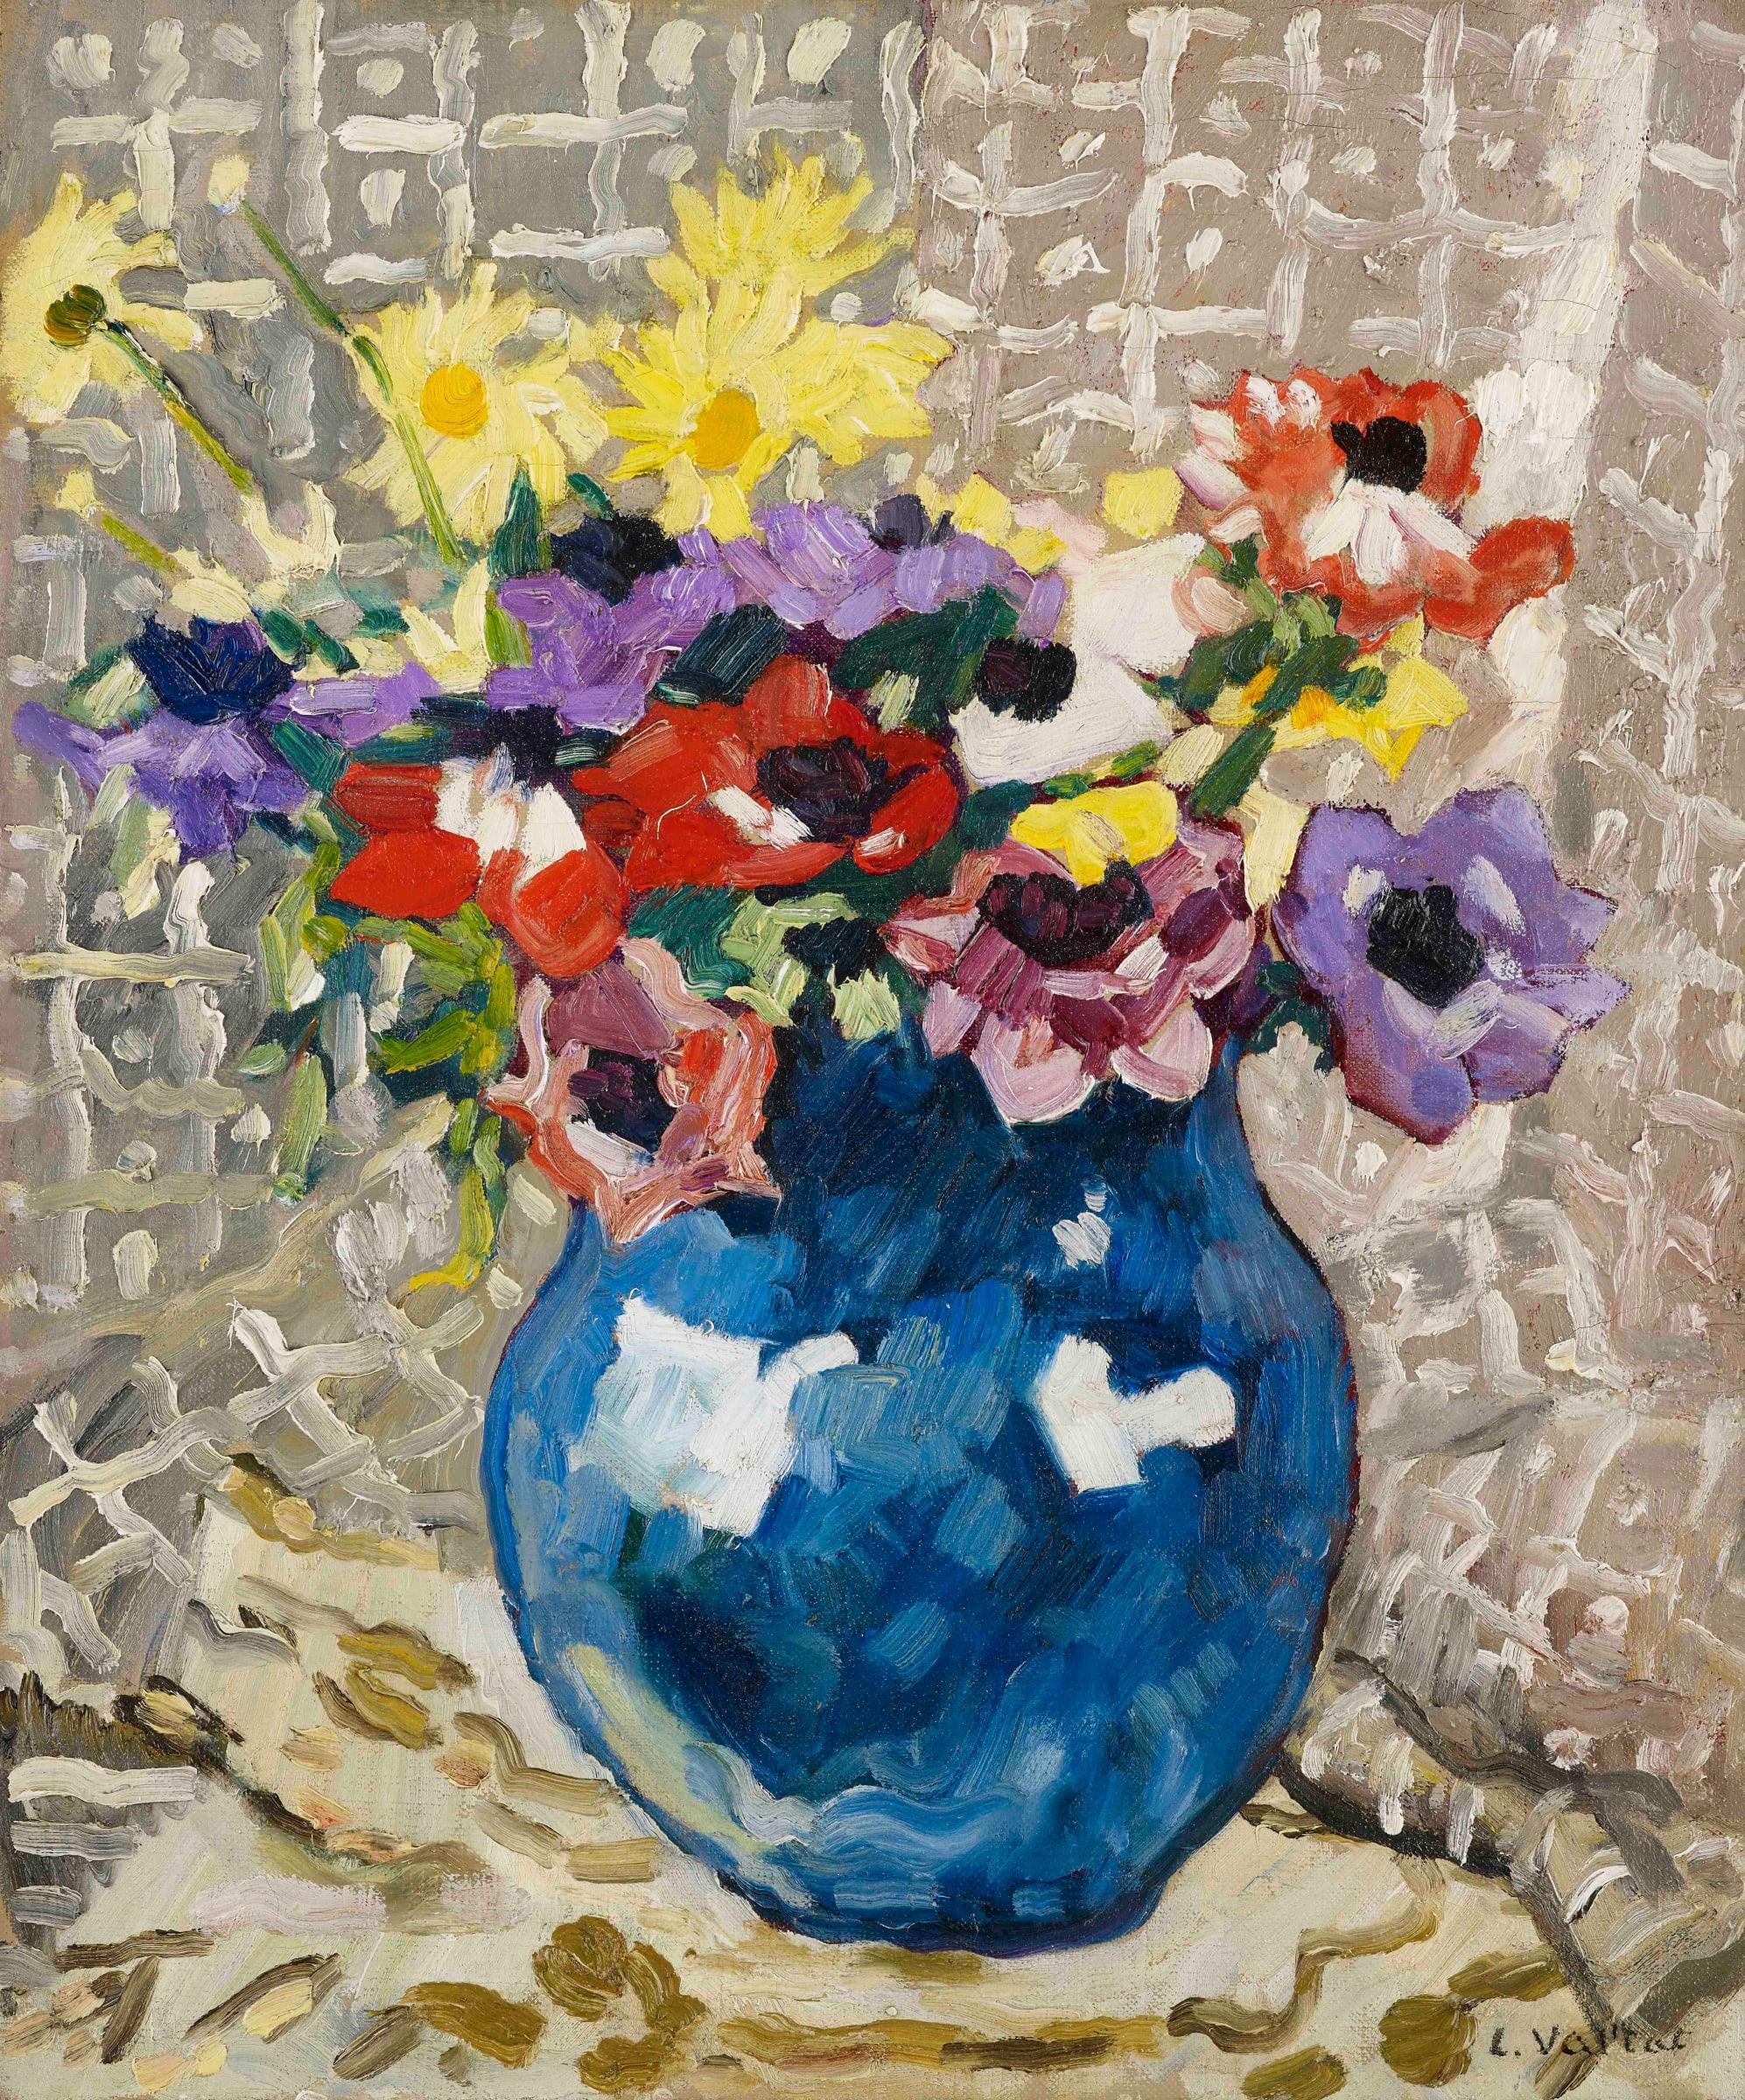 "<span class=""link fancybox-details-link""><a href=""/artists/78-louis-valtat/works/9424-louis-valtat-an-mones-et-marguerites-au-vase-bleu-1933/"">View Detail Page</a></span><div class=""artist""><span class=""artist""><strong>Louis Valtat</strong></span></div><div class=""title""><em>Anémones et marguerites au vase bleu</em>, 1933</div><div class=""signed_and_dated"">Signed lower right L.Valtat</div><div class=""medium"">Oil on canvas</div><div class=""dimensions"">55.1 x 46 cm<br /> 21 ¾ x 18 1/8 inches</div>"